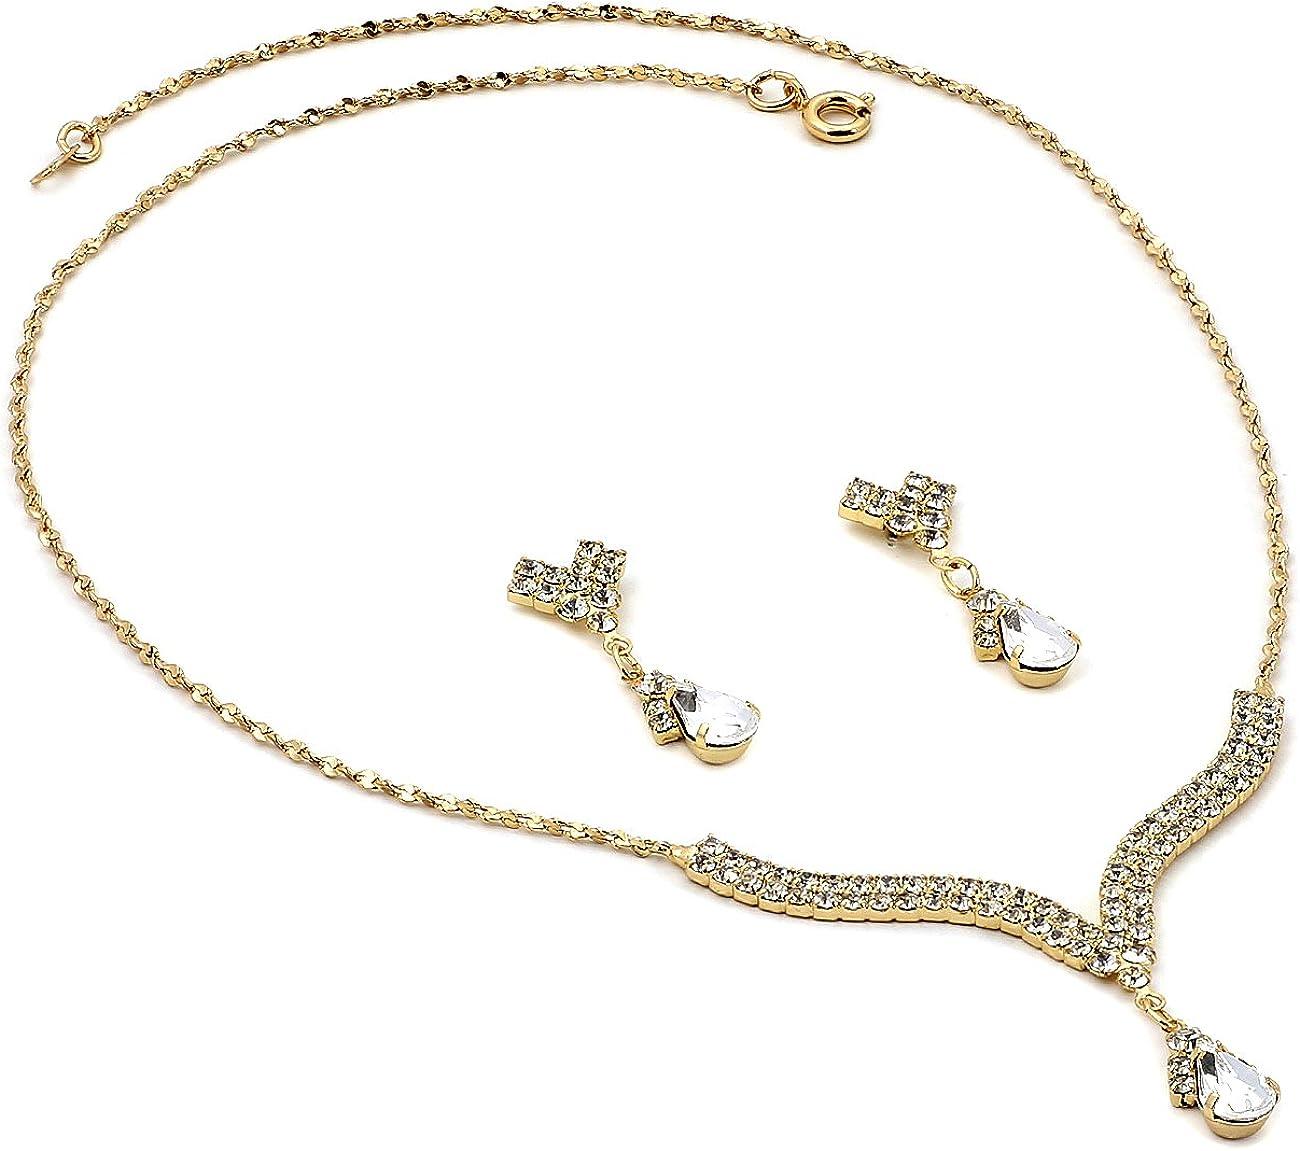 Topwholesalejewel Rhinestone Necklace with Jet Teardrop Center Matching Dangle Earrings Jewelry Set